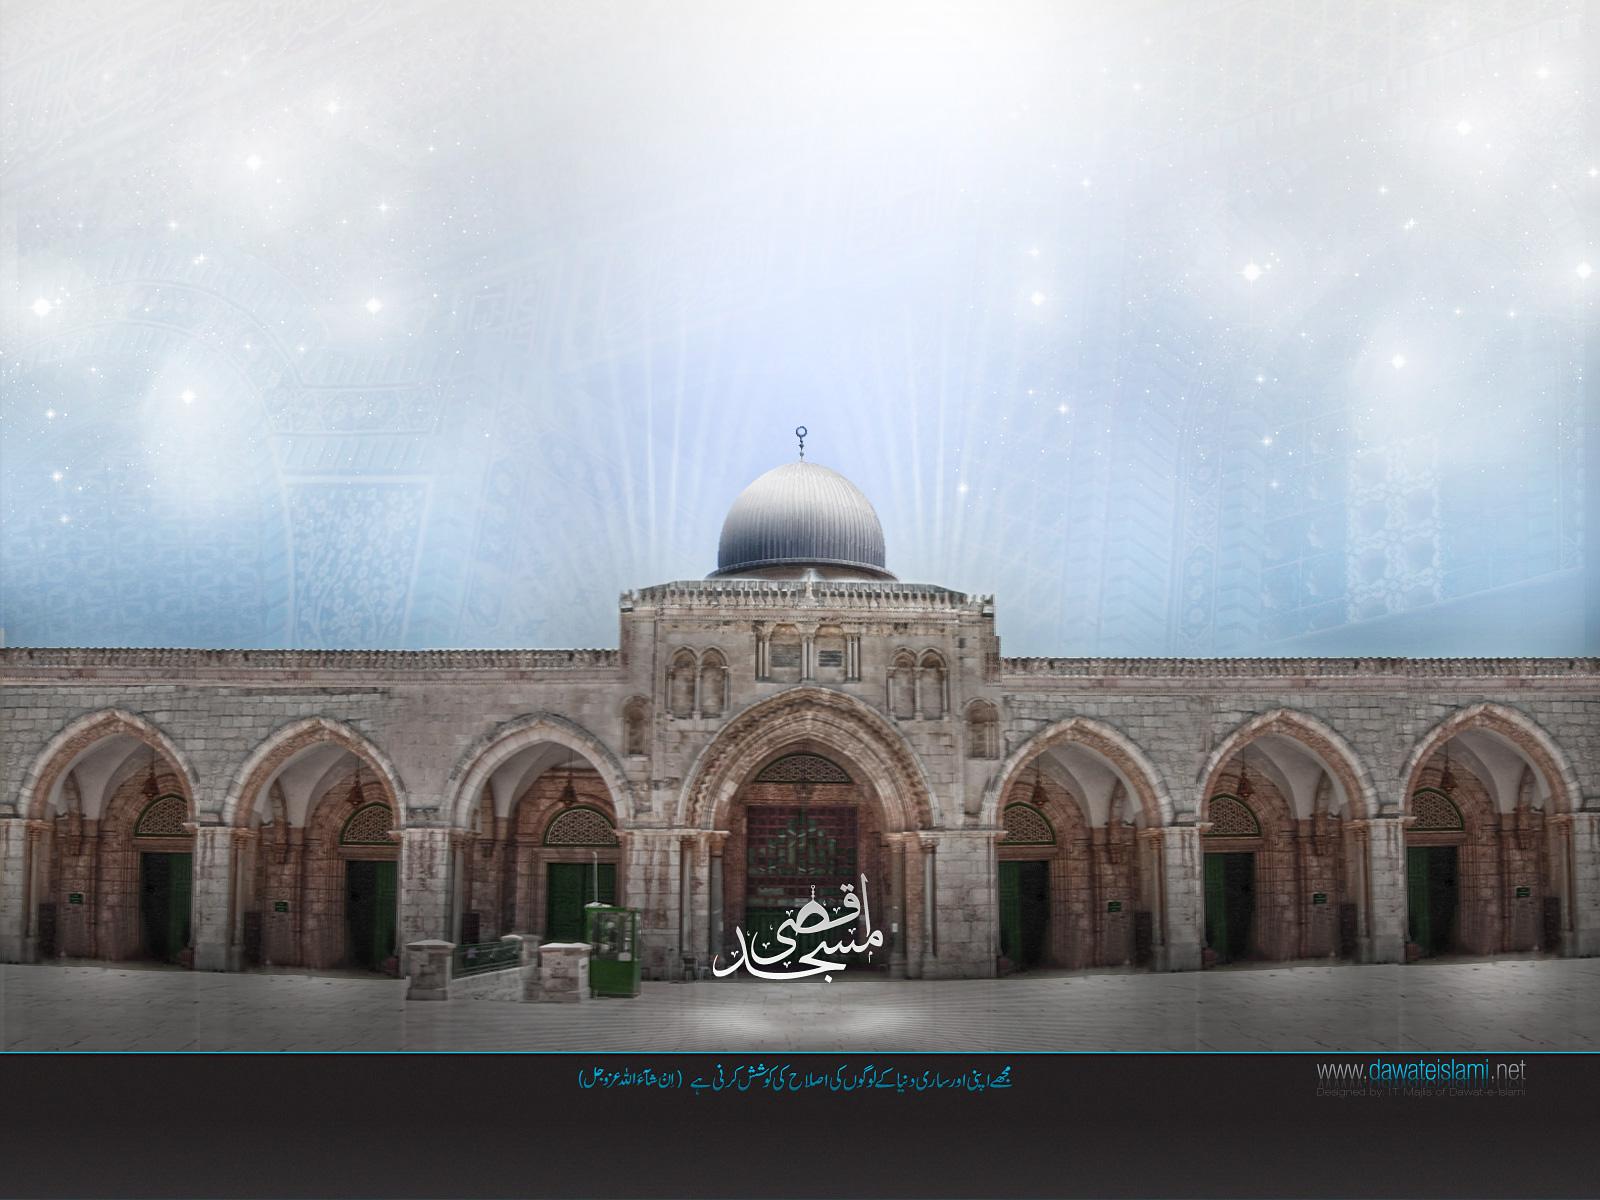 al aqsa mosque by kashifk on deviantart